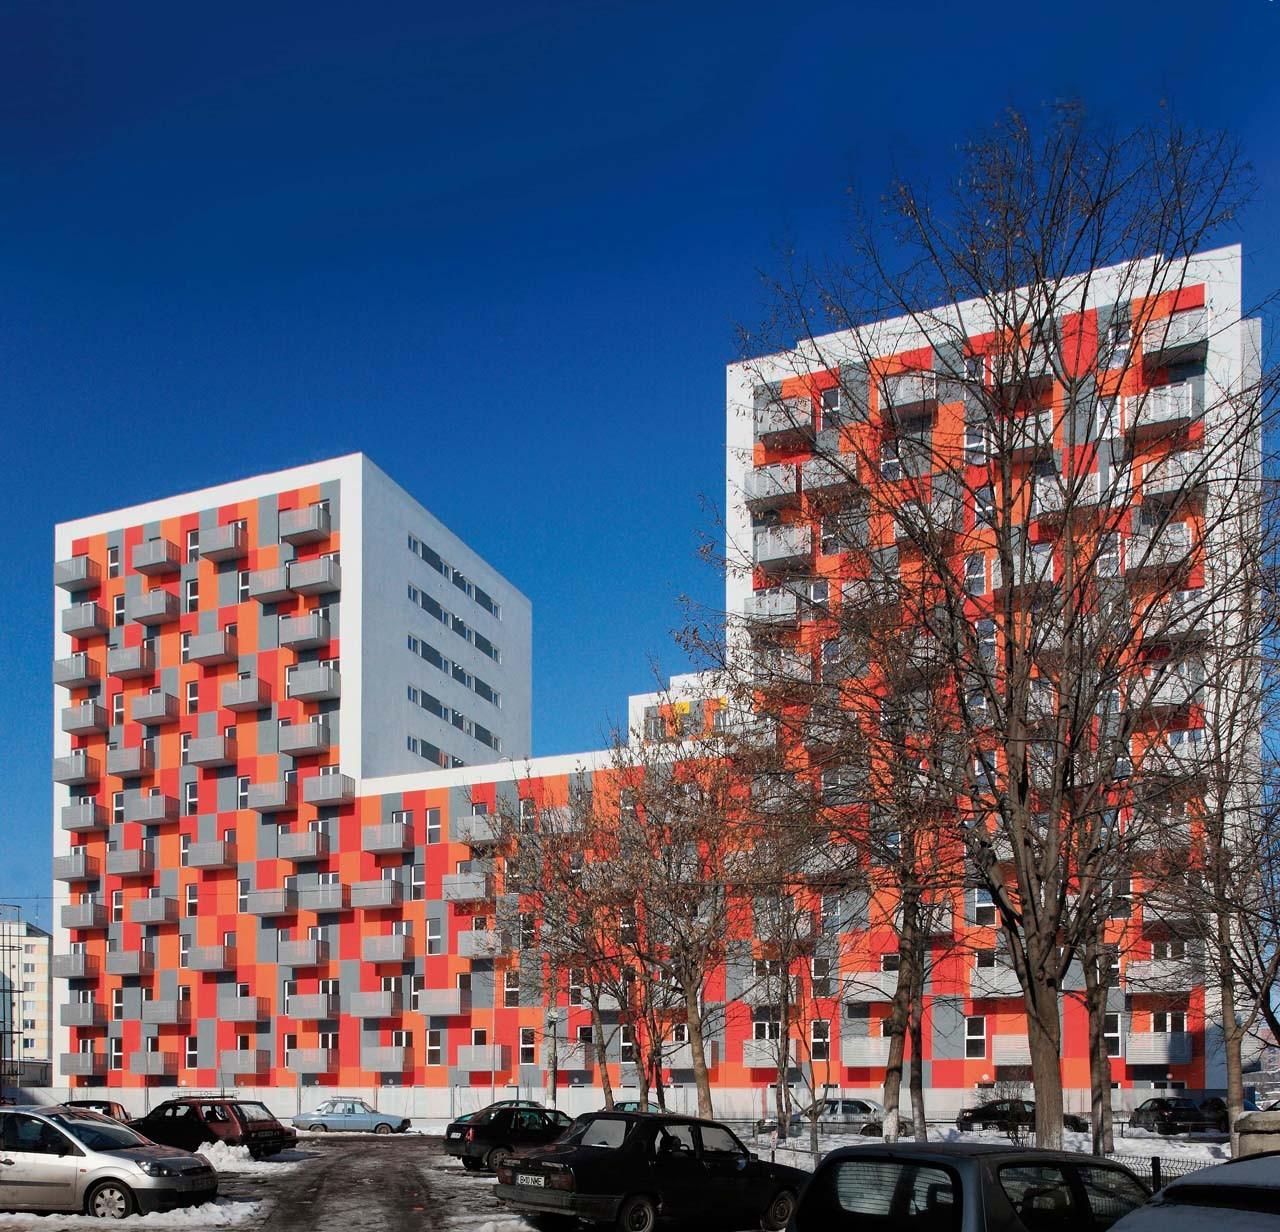 Conjunto residencial de alta densidad / Solano & Catalan, © Andrei Mârgulescu